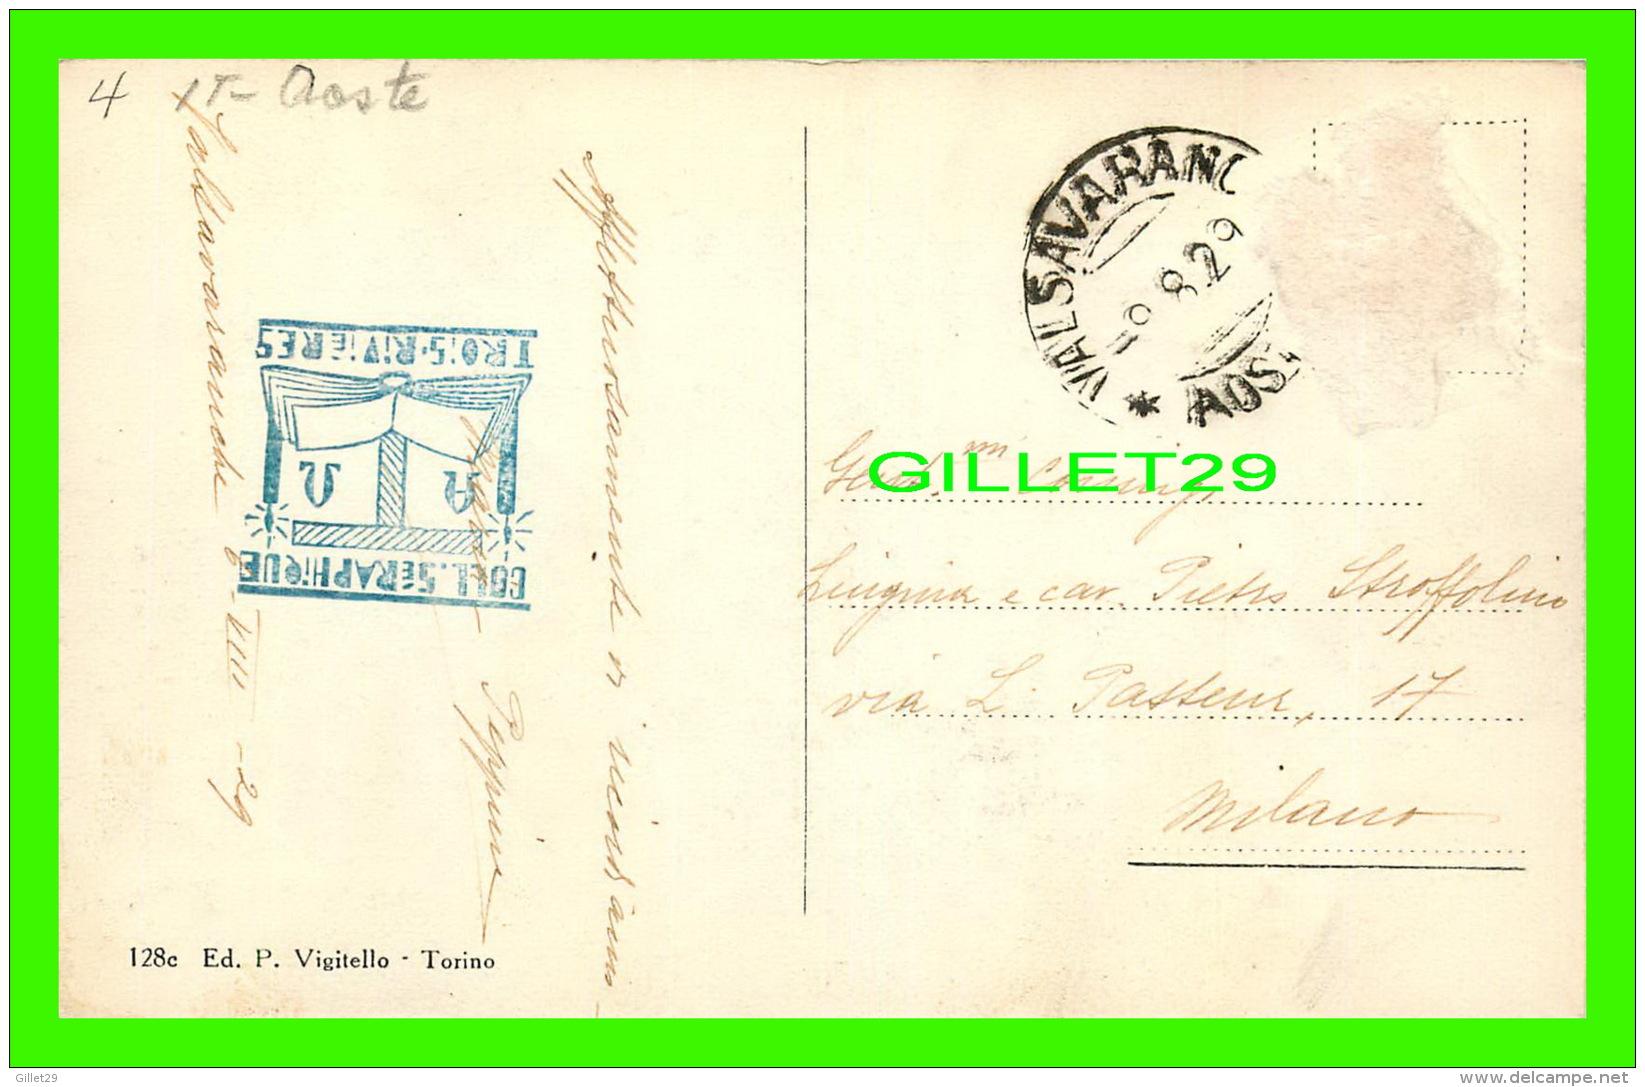 VALSAVARANCHE, ITALIE - FRAZIONE VERS LE BOIS M. 1541 - CIRCULÉE EN 1929 - ED. P. VIGITELLO - - Italie